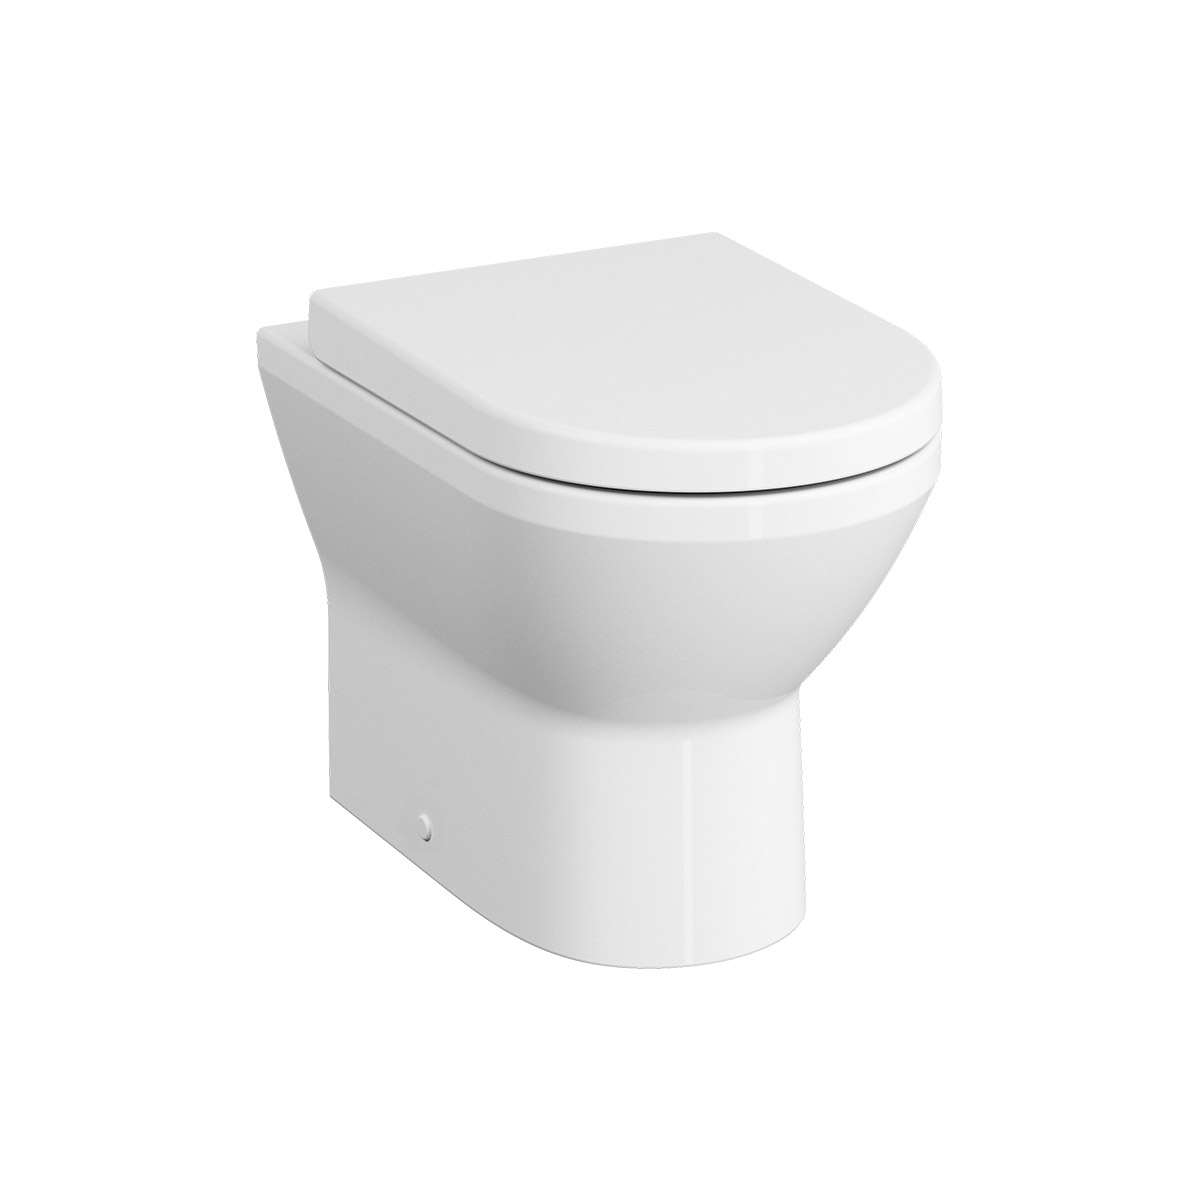 Integra Stand-WC VitrA Flush 2.0 (ohne Spülrand), mit Bidetfunktion, Tiefspüler